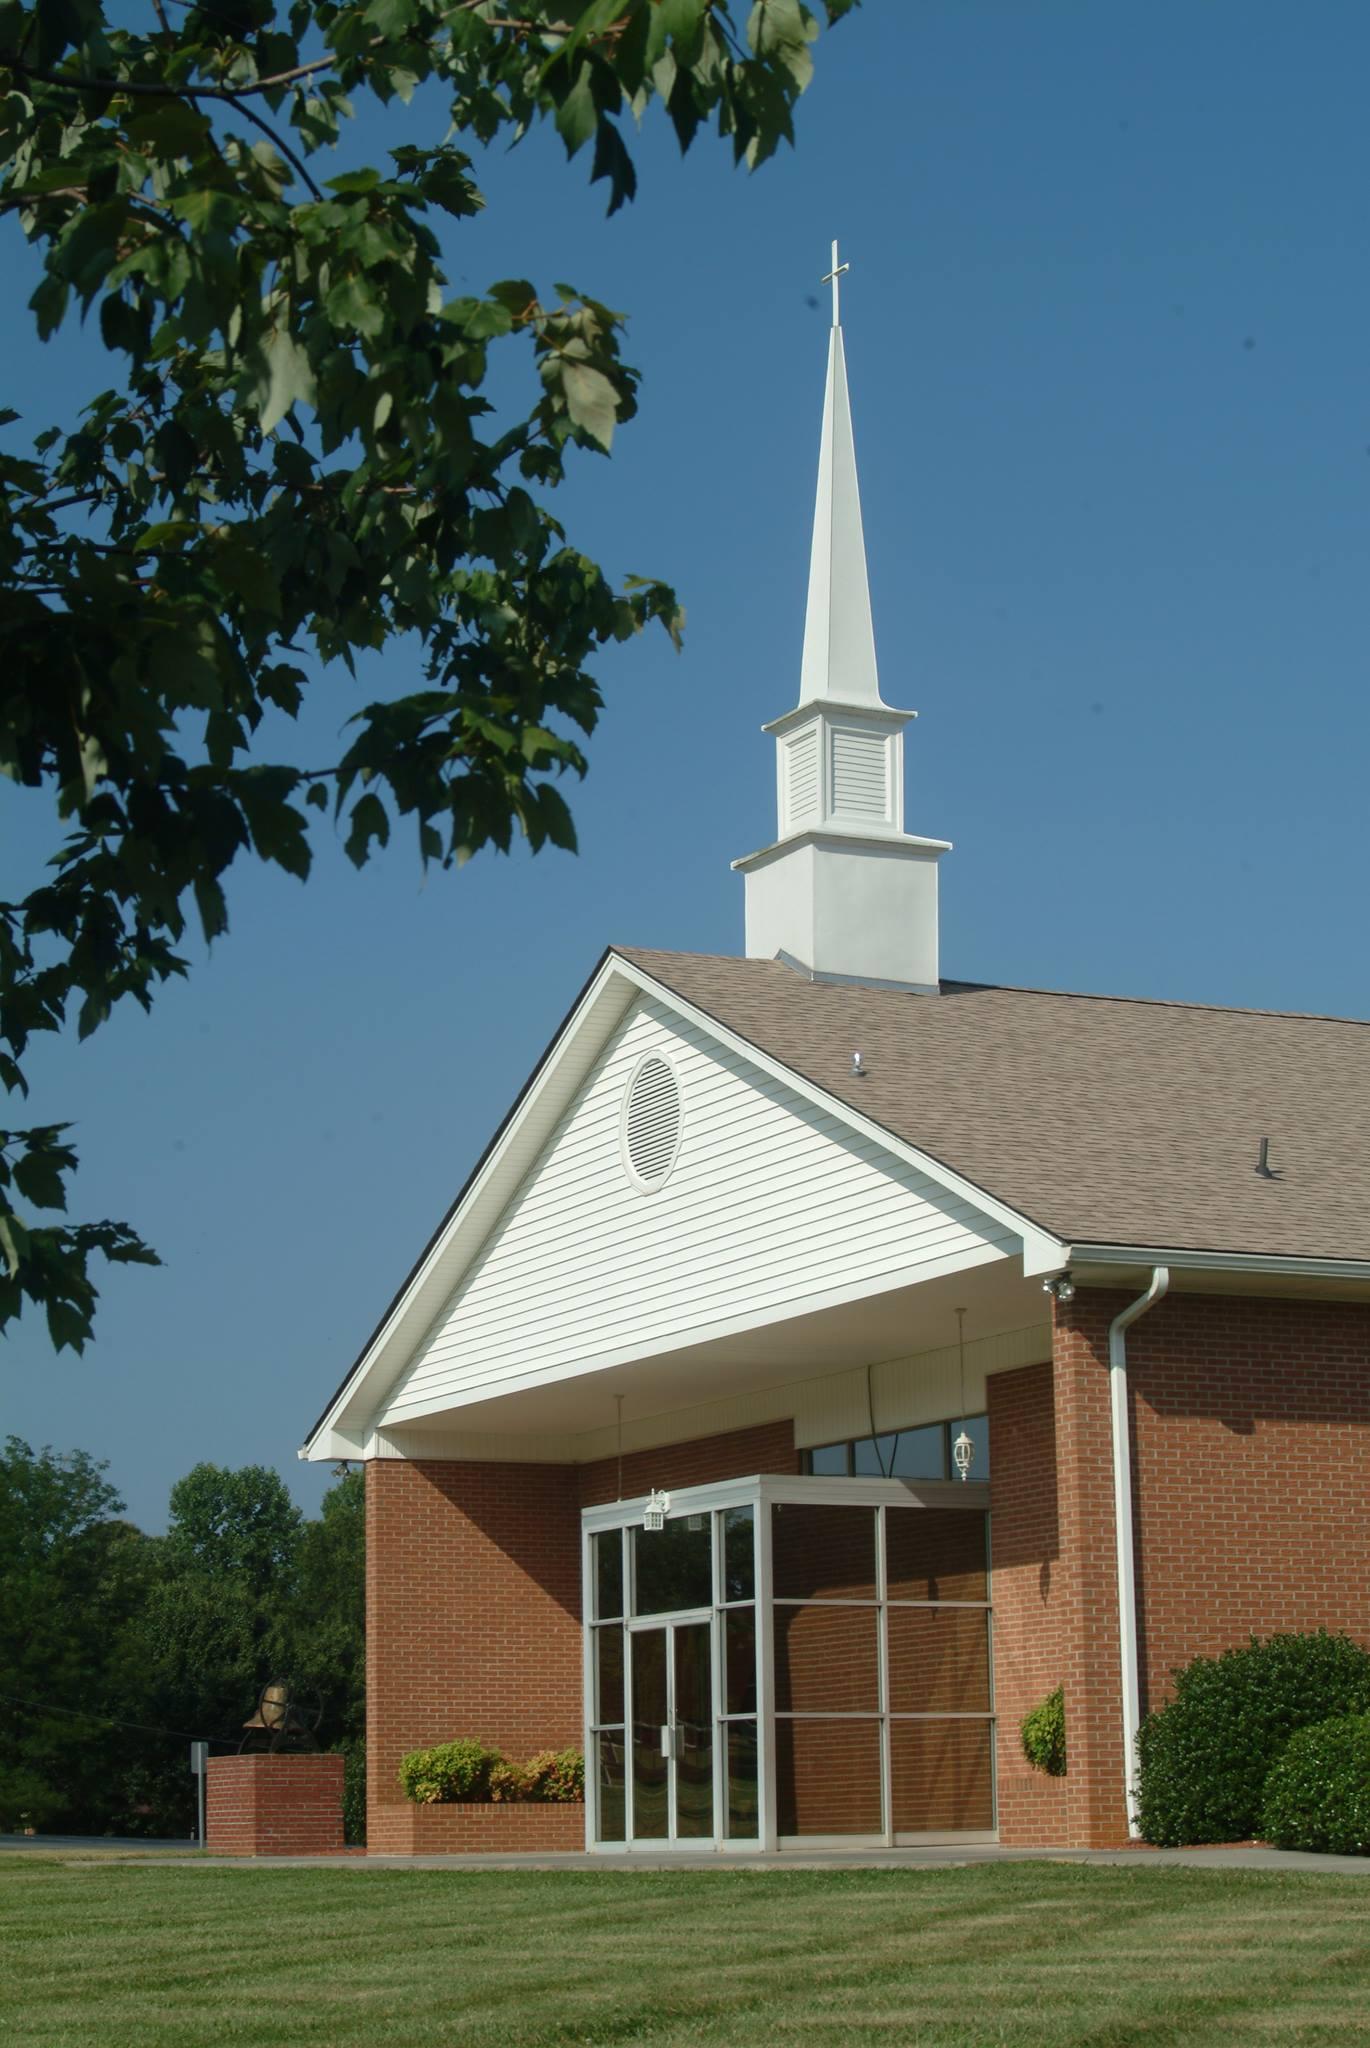 Bethel Baptist Church  Rockwell NC  KJV Churches